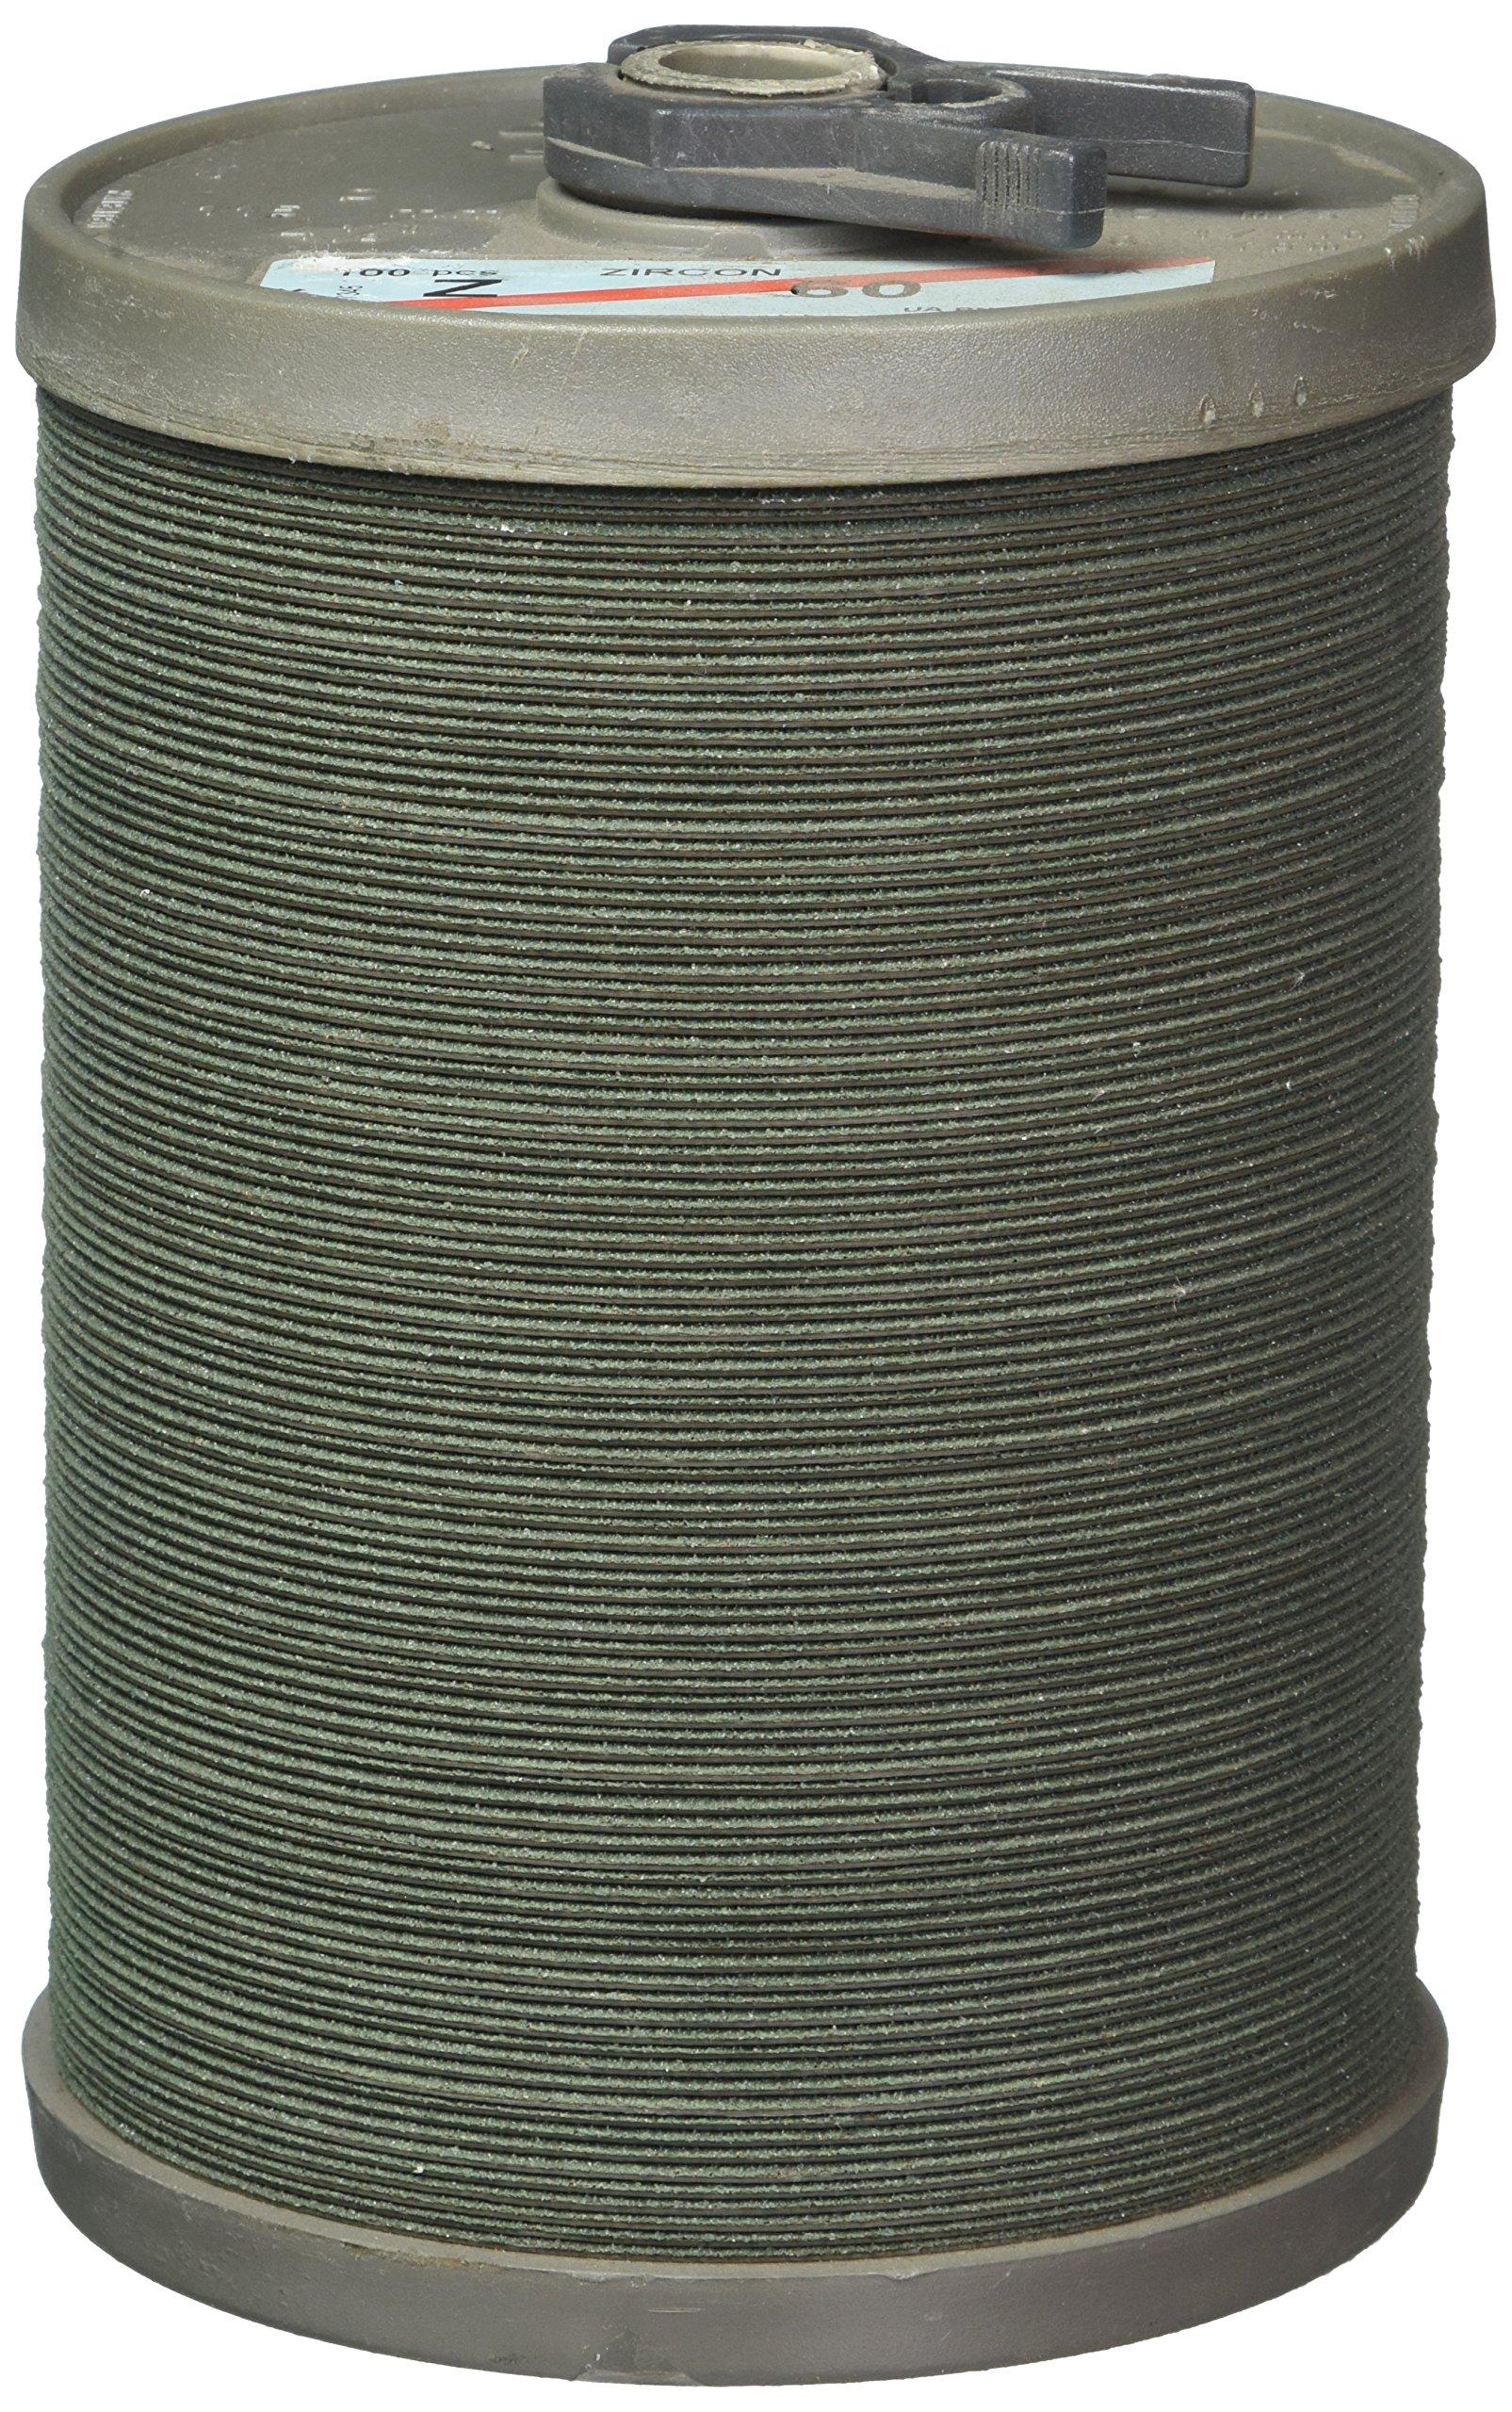 United Abrasives-SAIT 59260 SAIT Fiber Disc, Z 4-1/2 X 7/8 60X Bulk Disc, 100 Pack